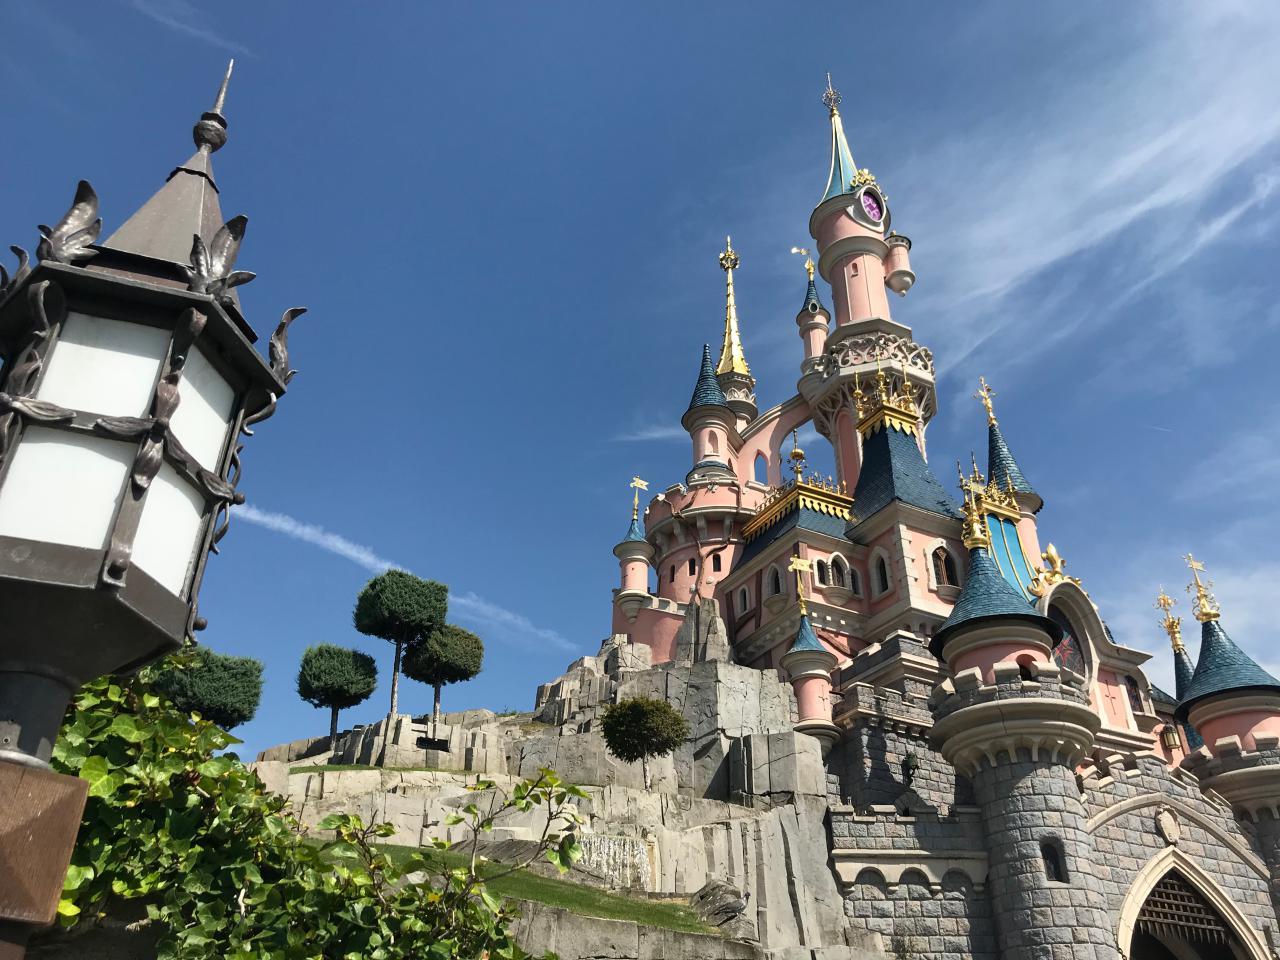 Schloss - Disneyland Paris im Juli 2018